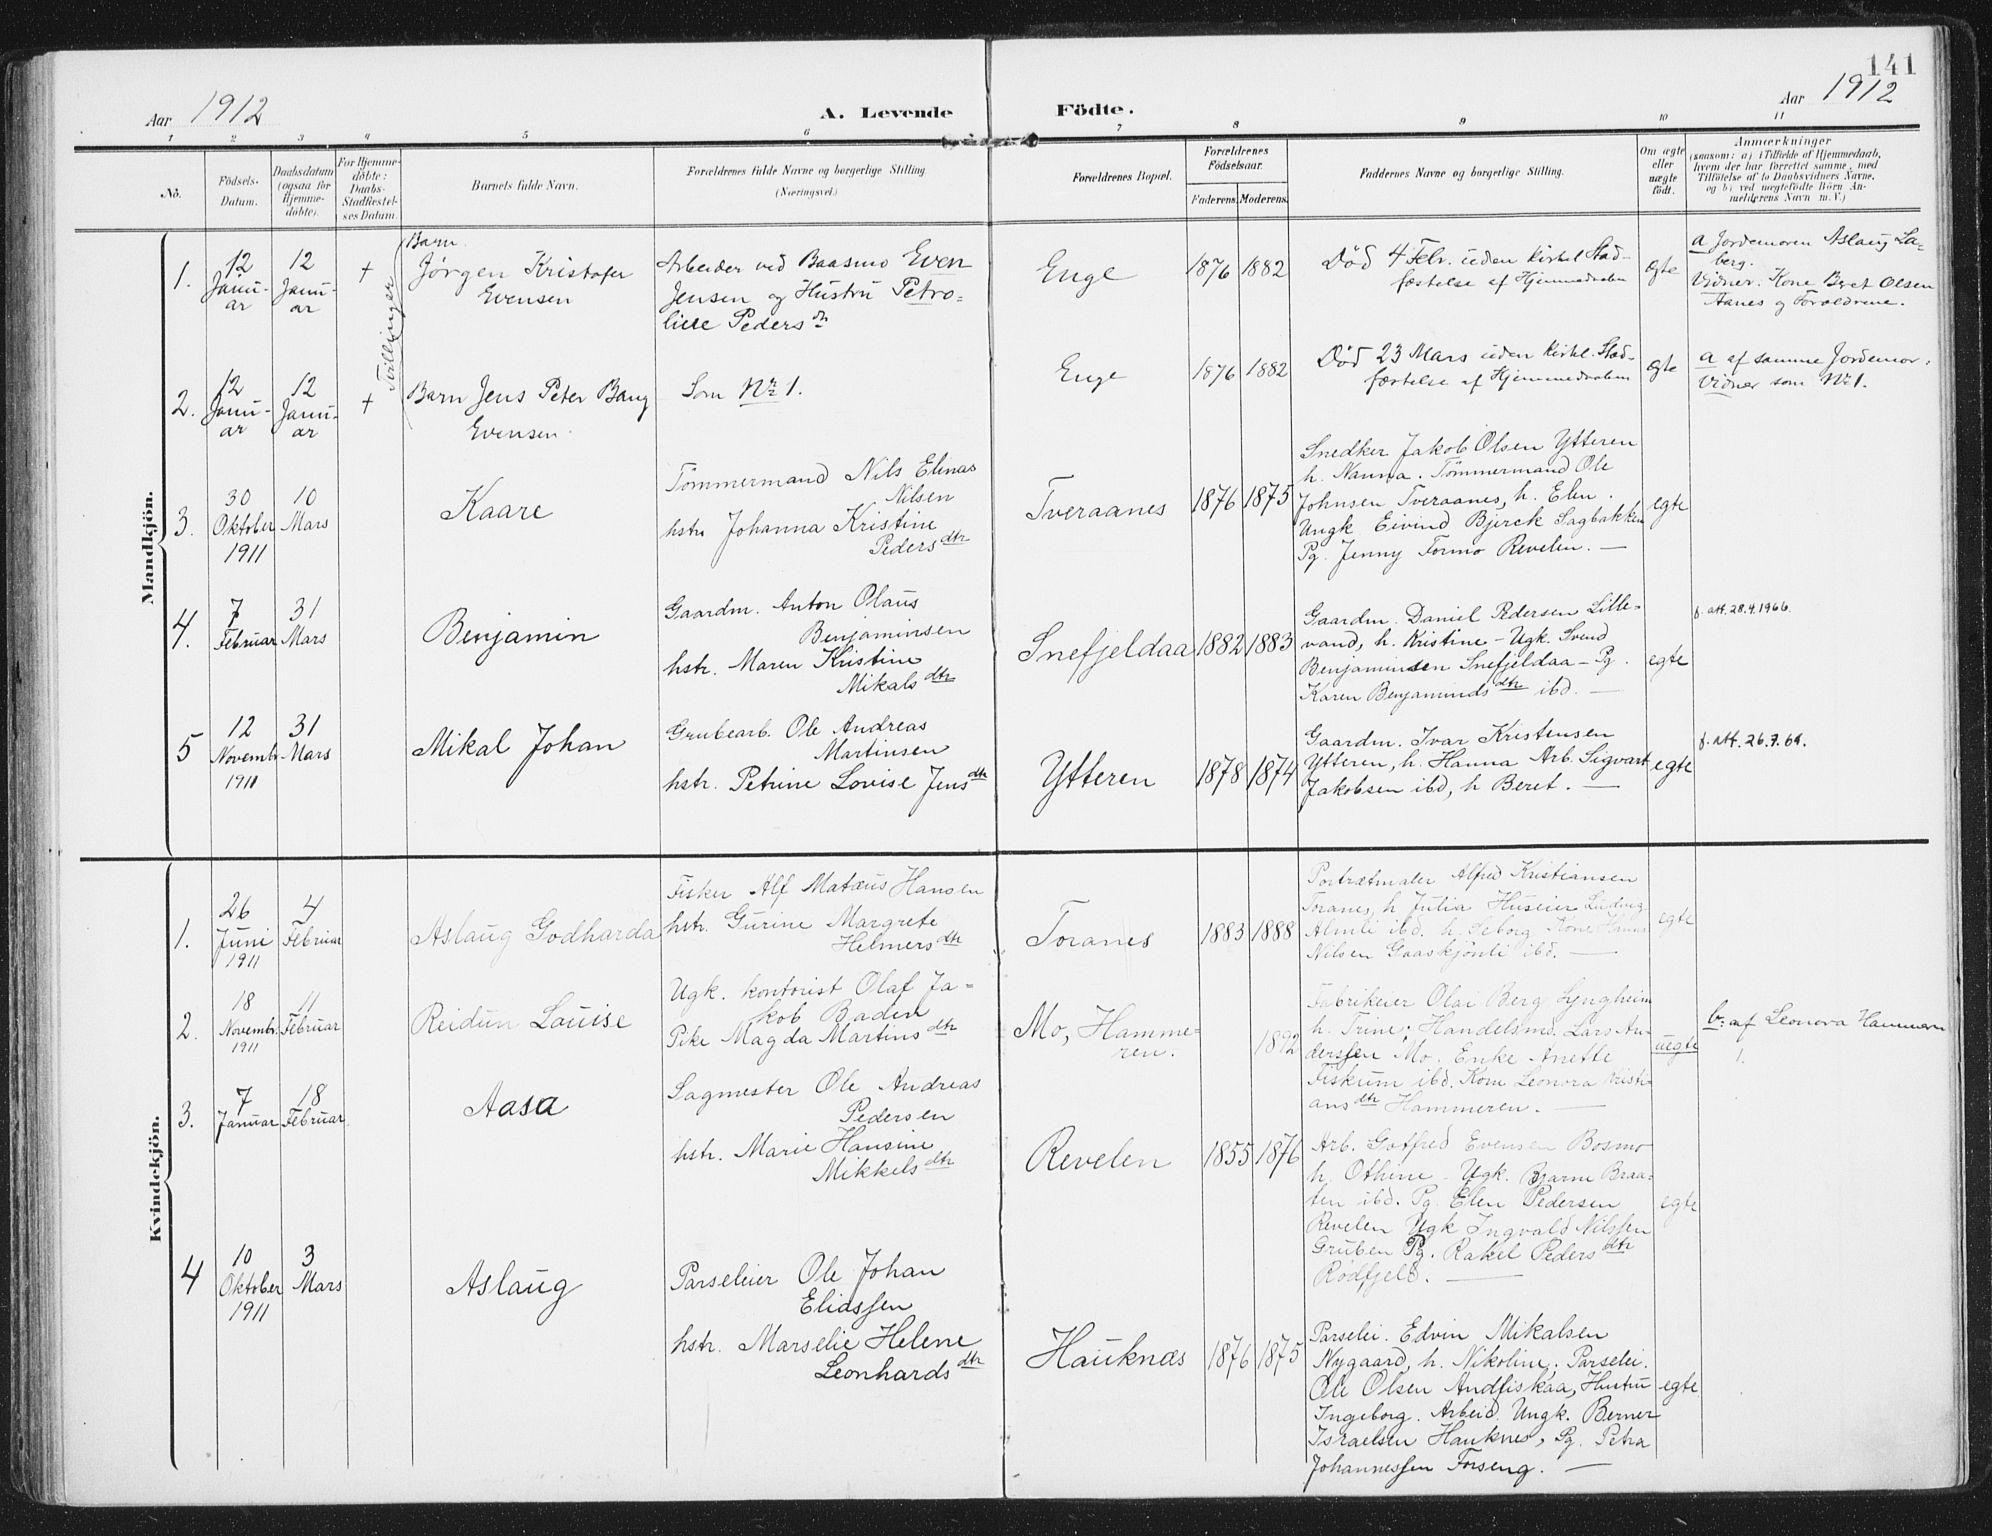 SAT, Ministerialprotokoller, klokkerbøker og fødselsregistre - Nordland, 827/L0402: Ministerialbok nr. 827A14, 1903-1912, s. 141